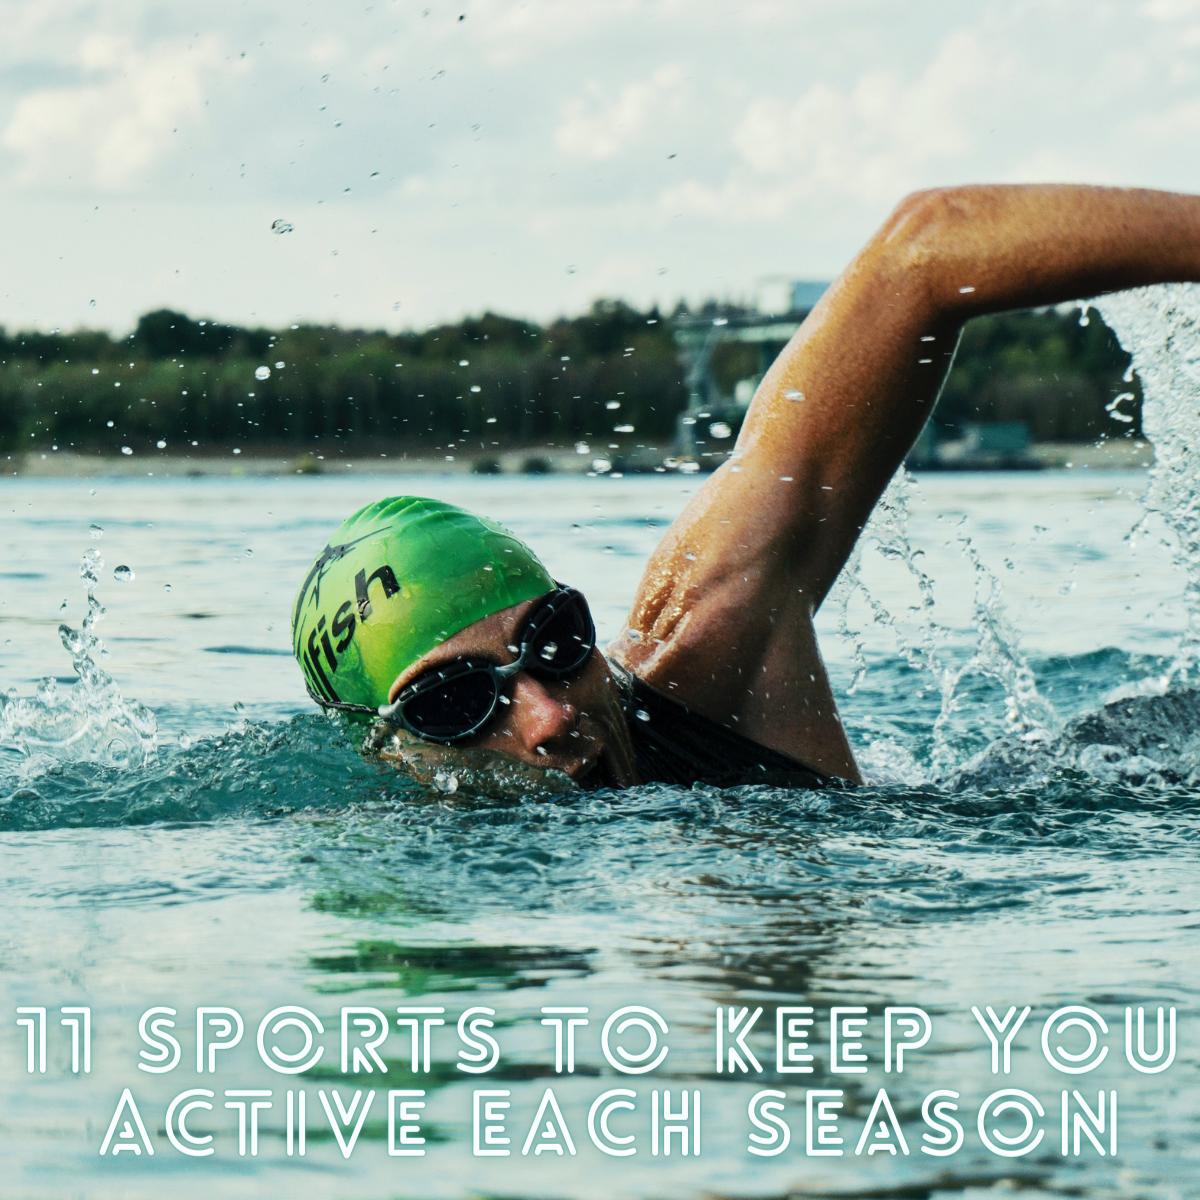 11 Sports To Keep You Active Each Season